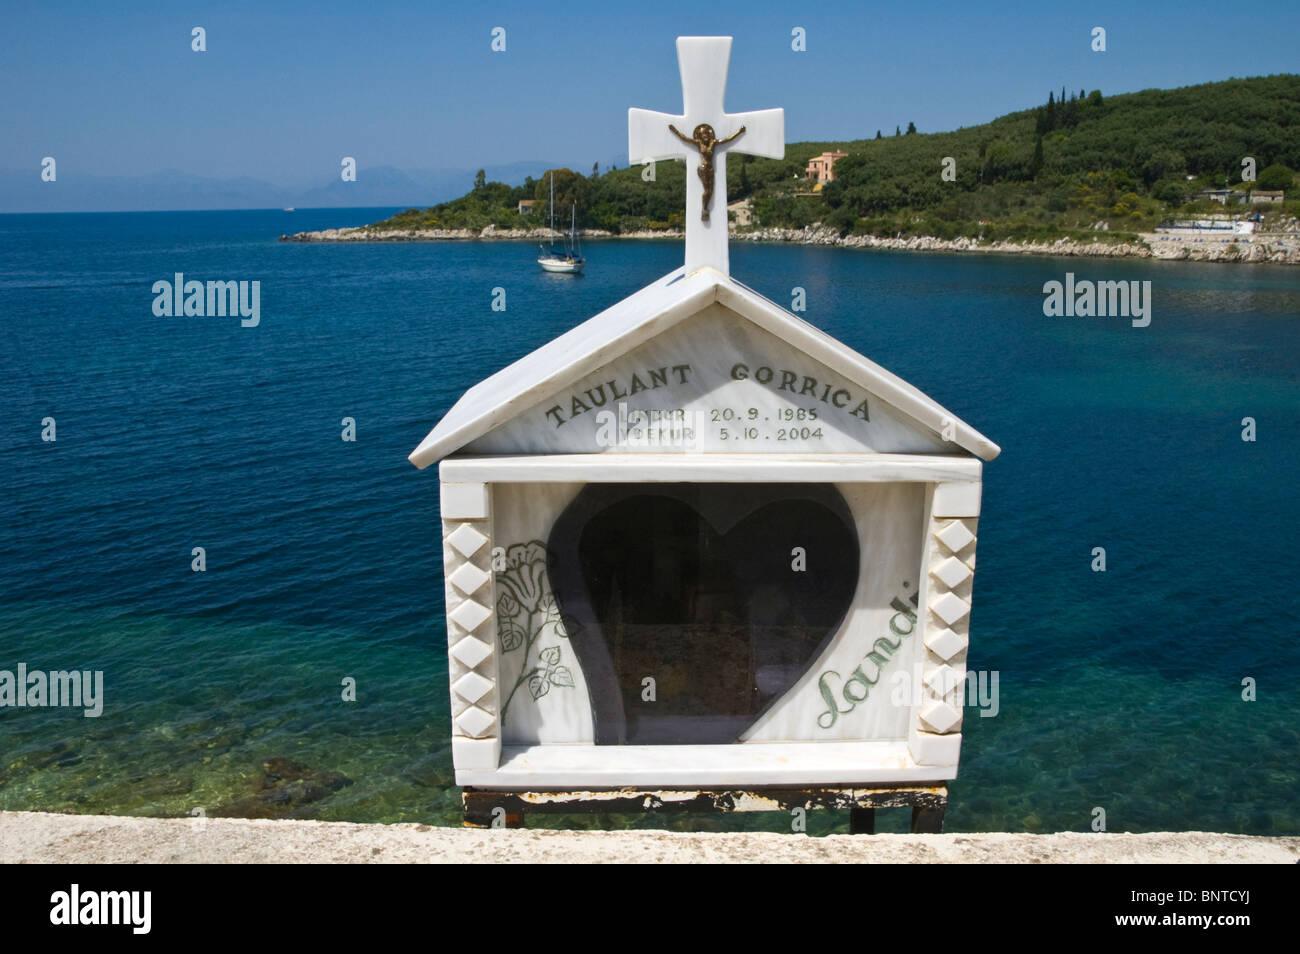 Roadside shrine overlooking bay at Kassiopi on the Greek Mediterranean island of Corfu Greece GR - Stock Image